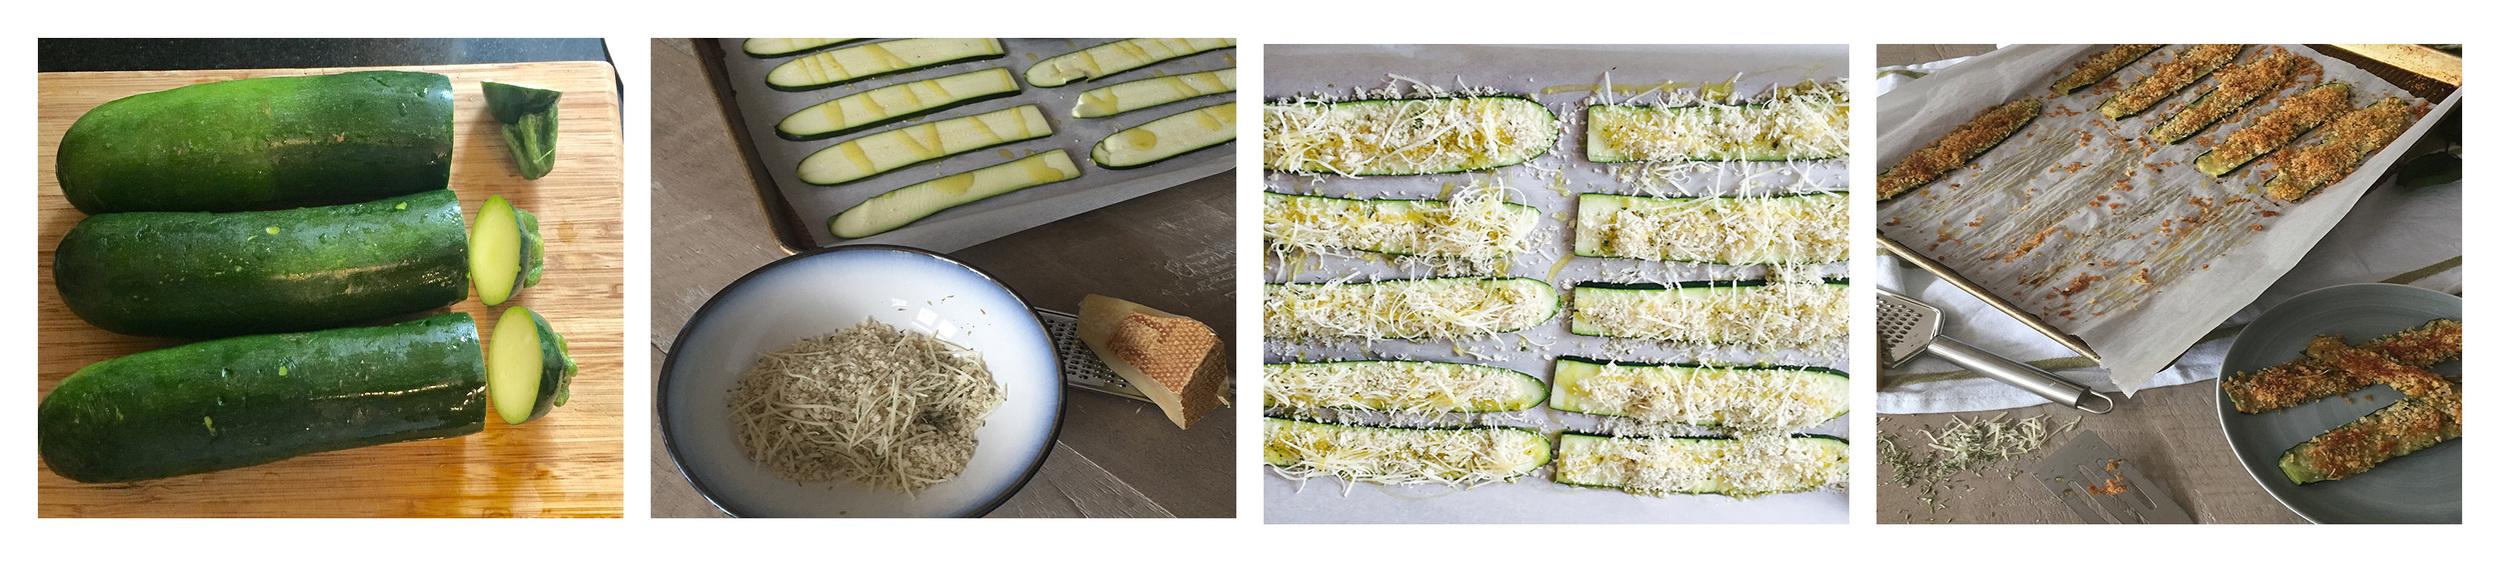 Vegetable Gratin, Step By Step.